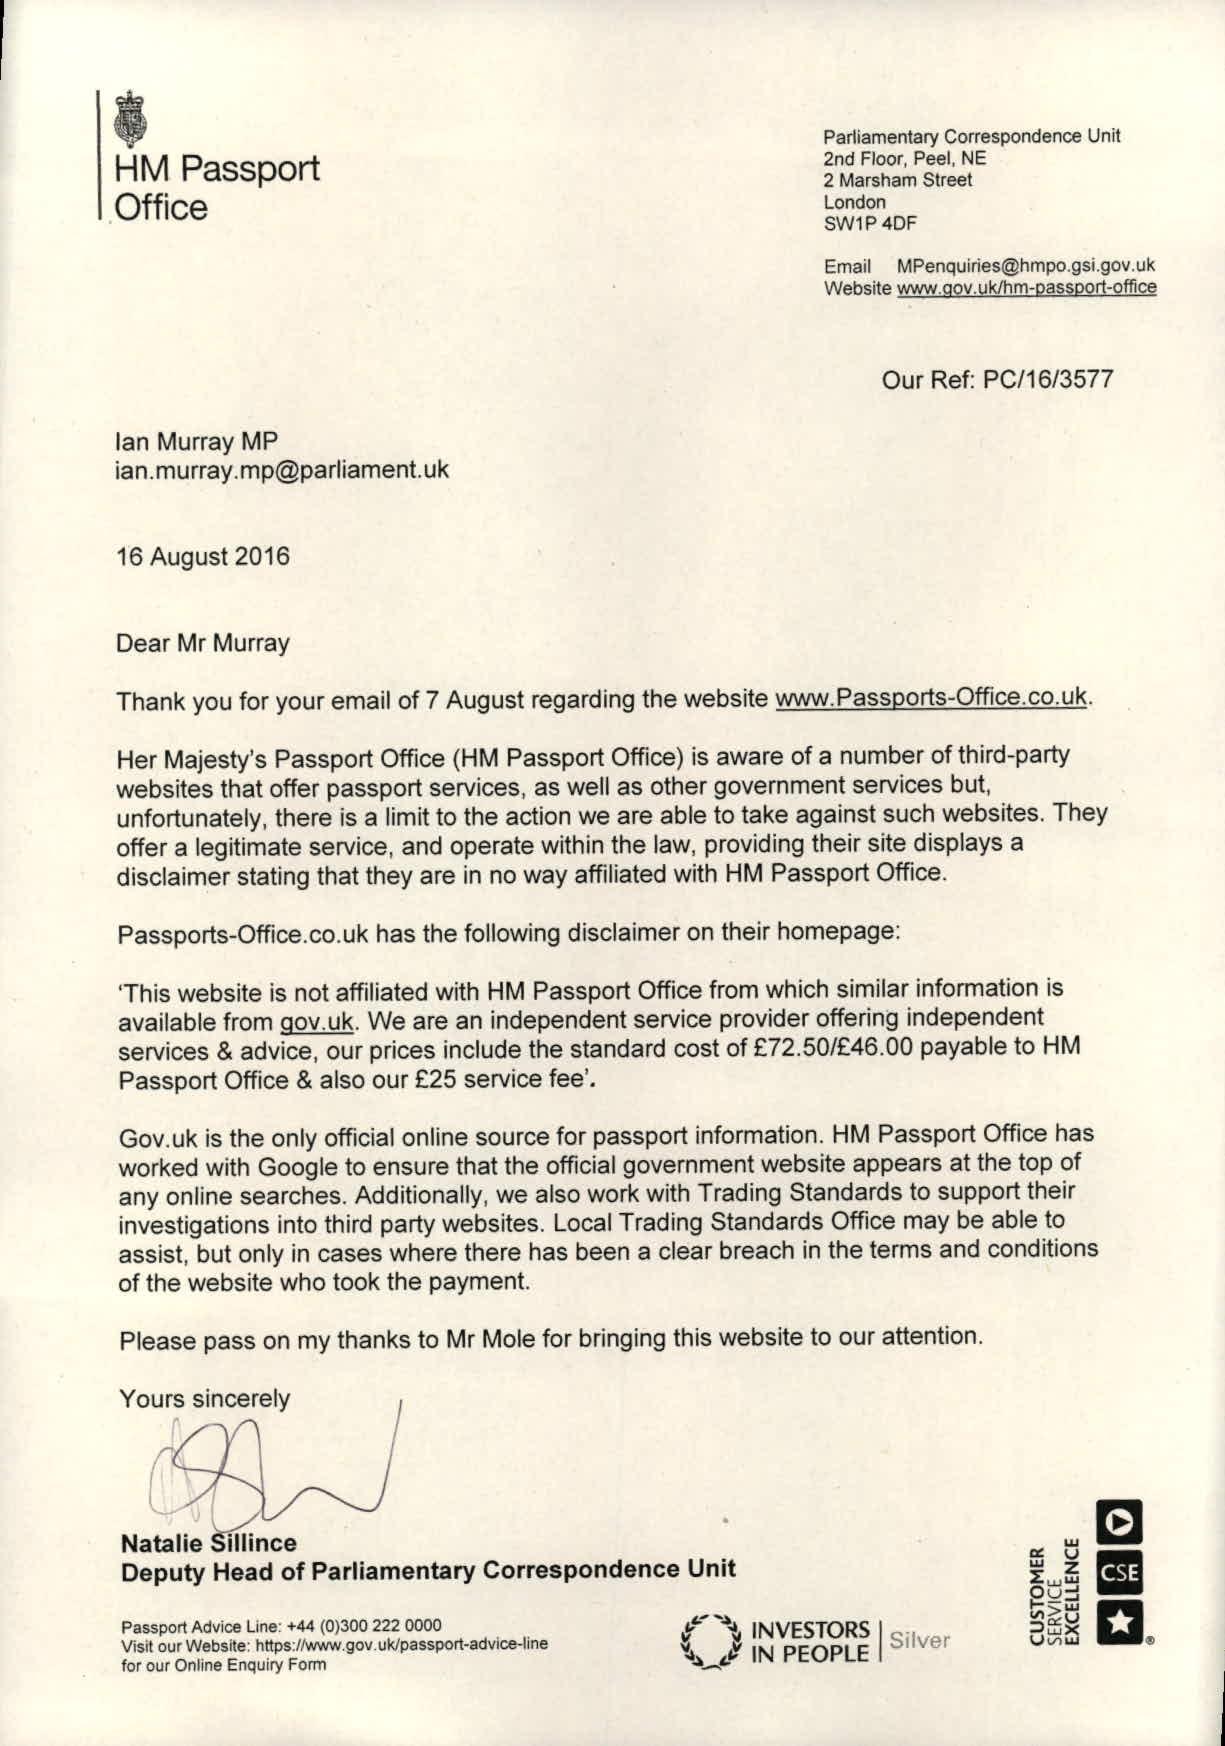 Response_PC_16_3577_Ian_Murray_MP-page-001.jpg